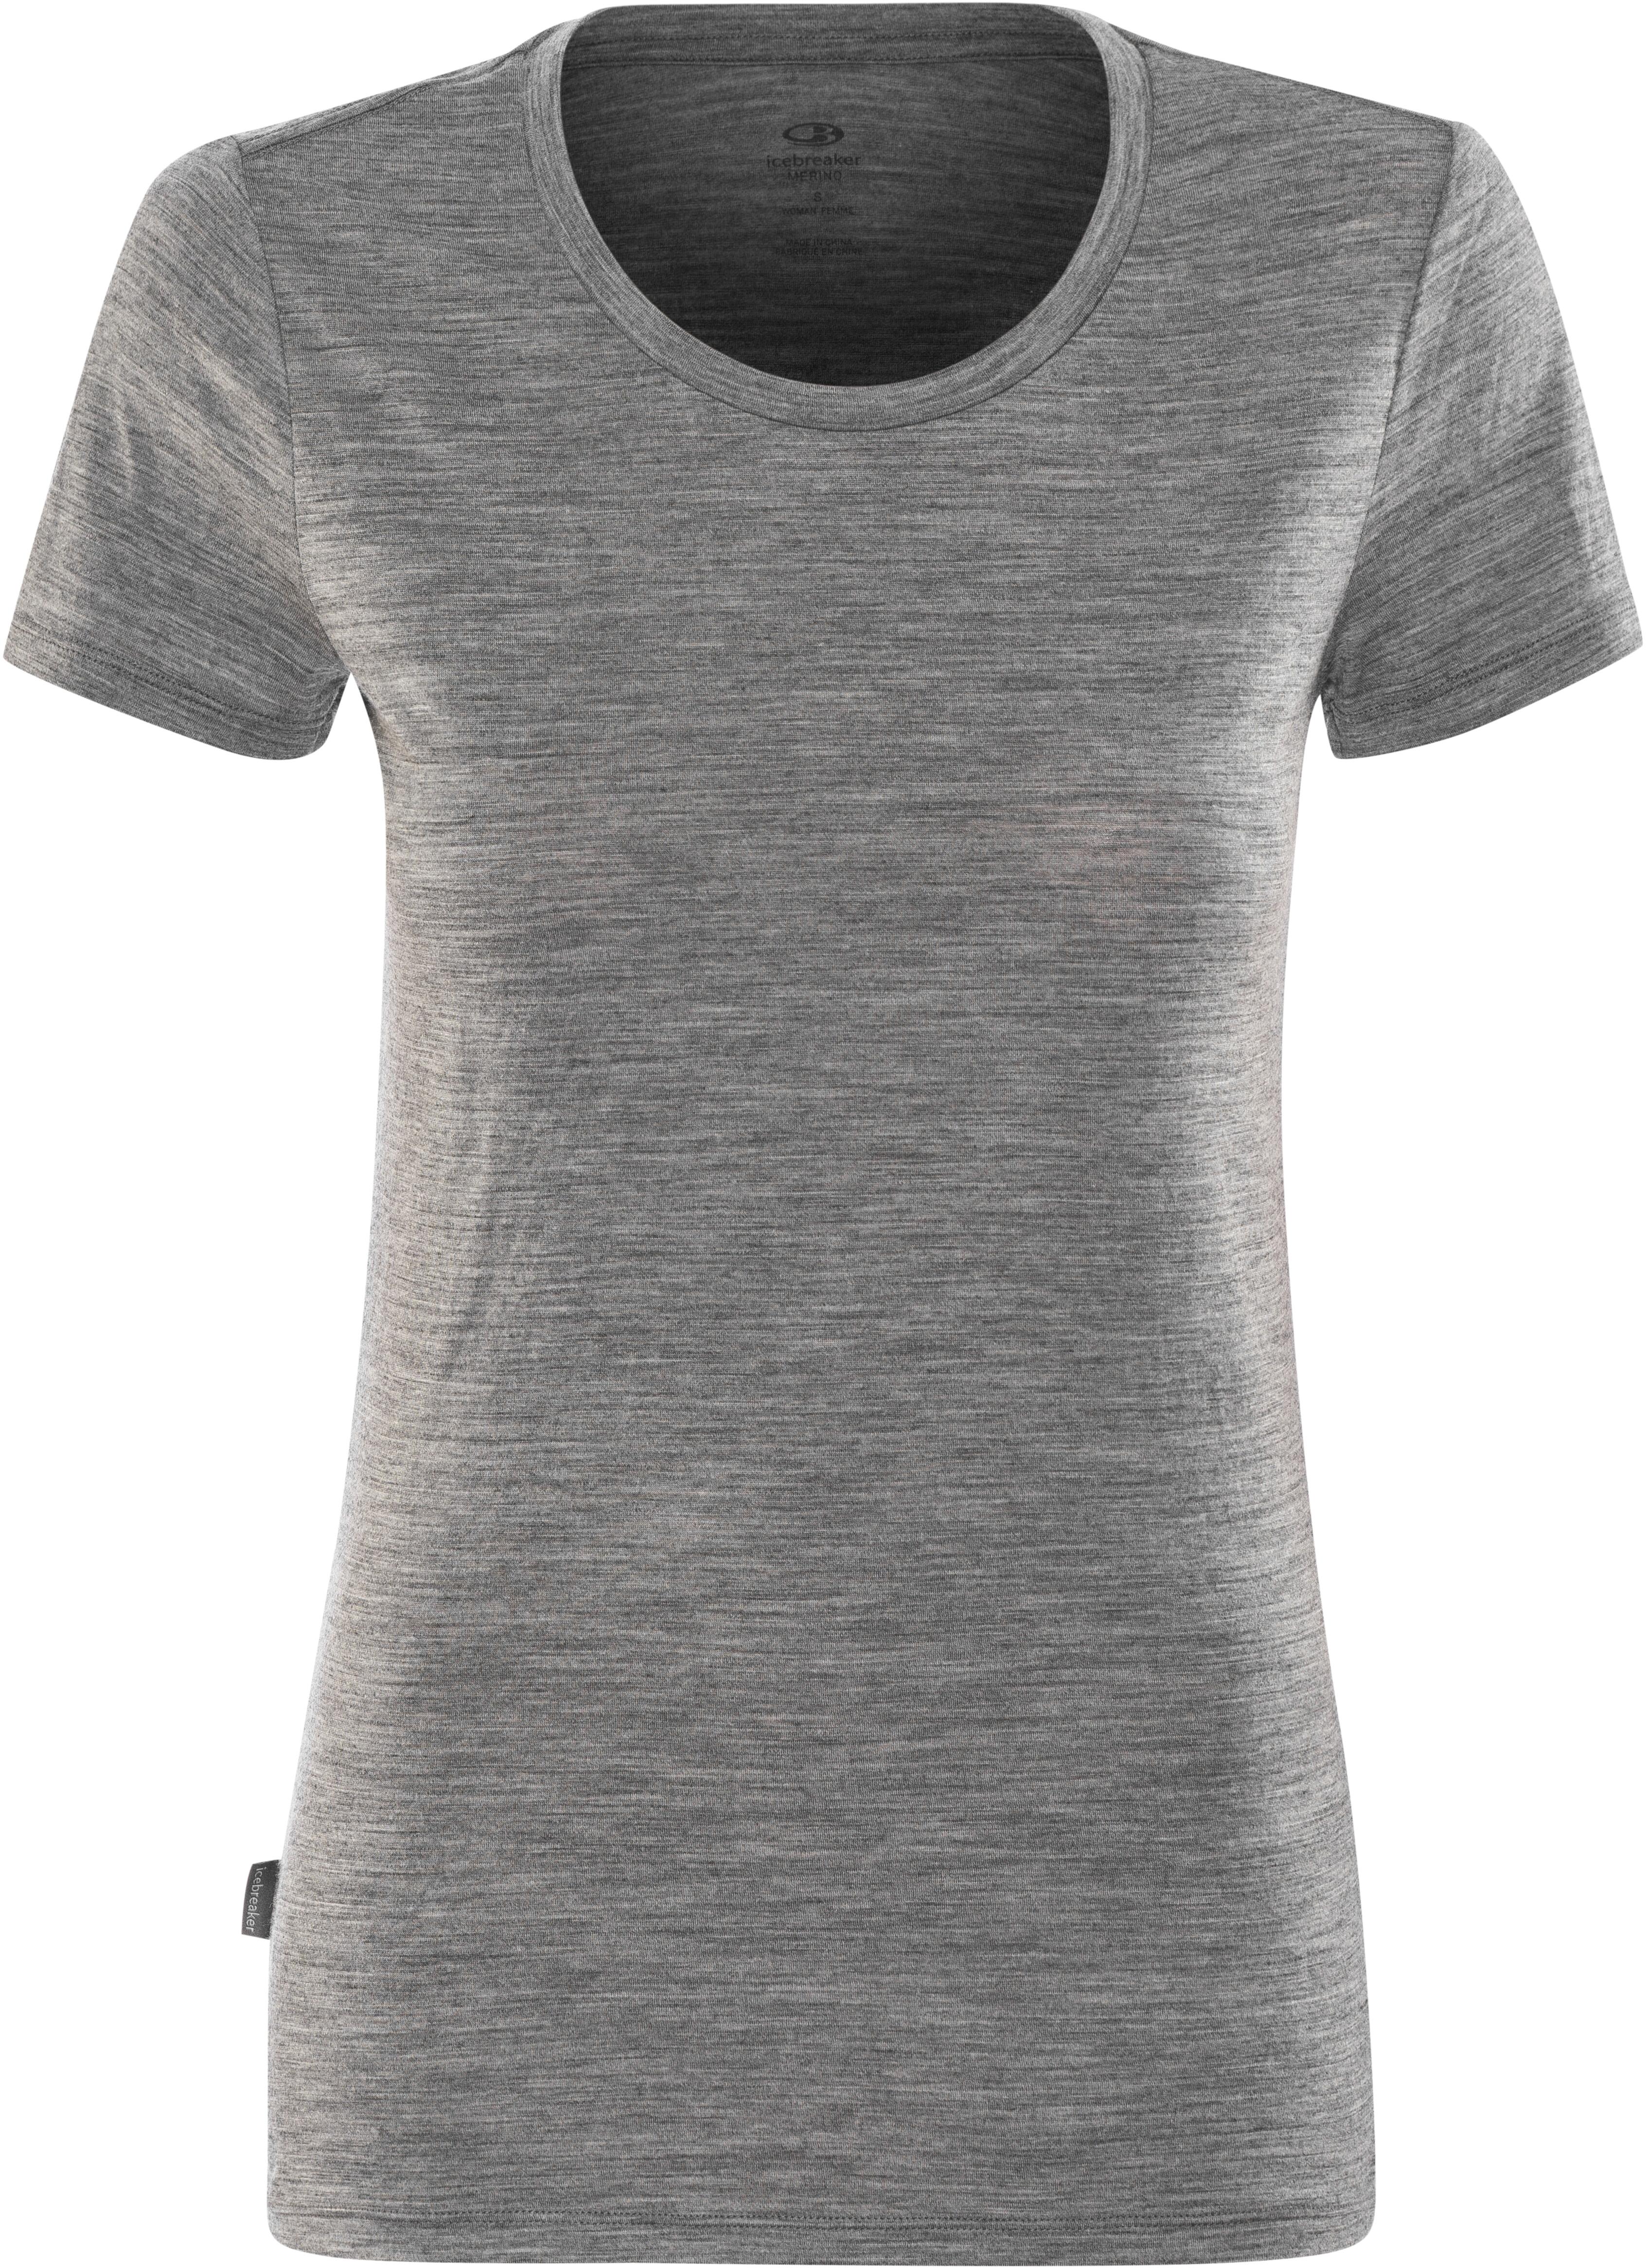 043425974e6 Icebreaker Tech Lite - T-shirt manches courtes Femme - gris